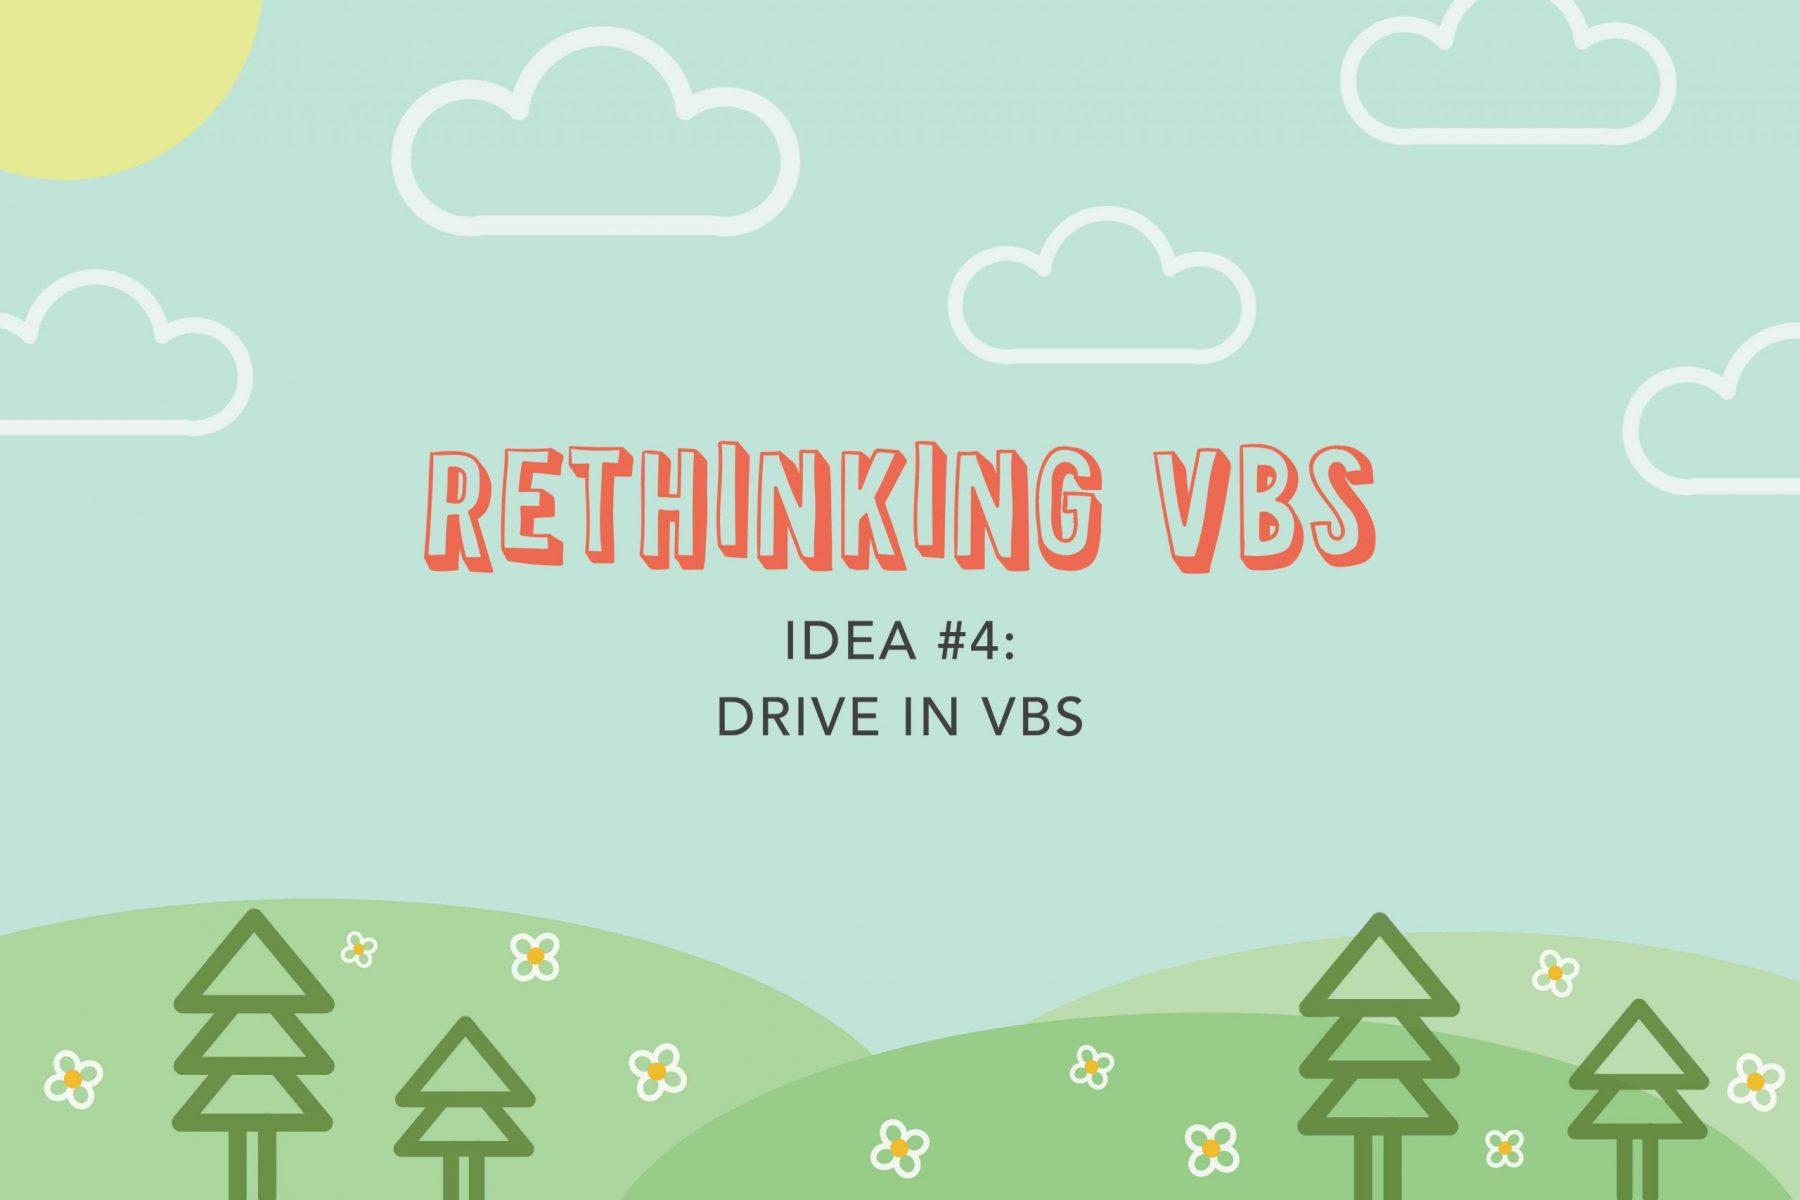 drive-thru VBS activity